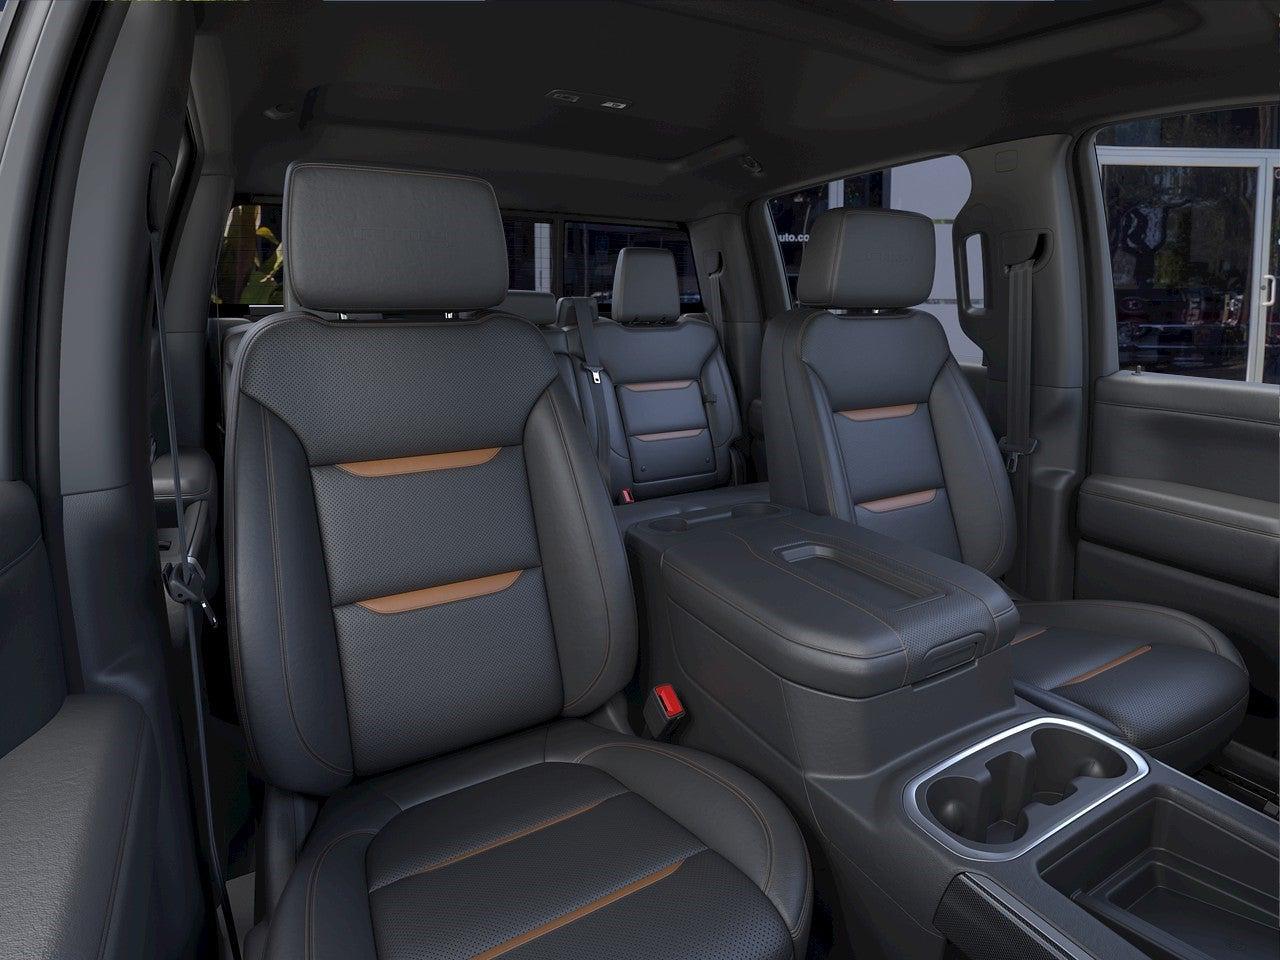 2021 GMC Sierra 1500 Crew Cab 4x4, Pickup #T21318 - photo 14